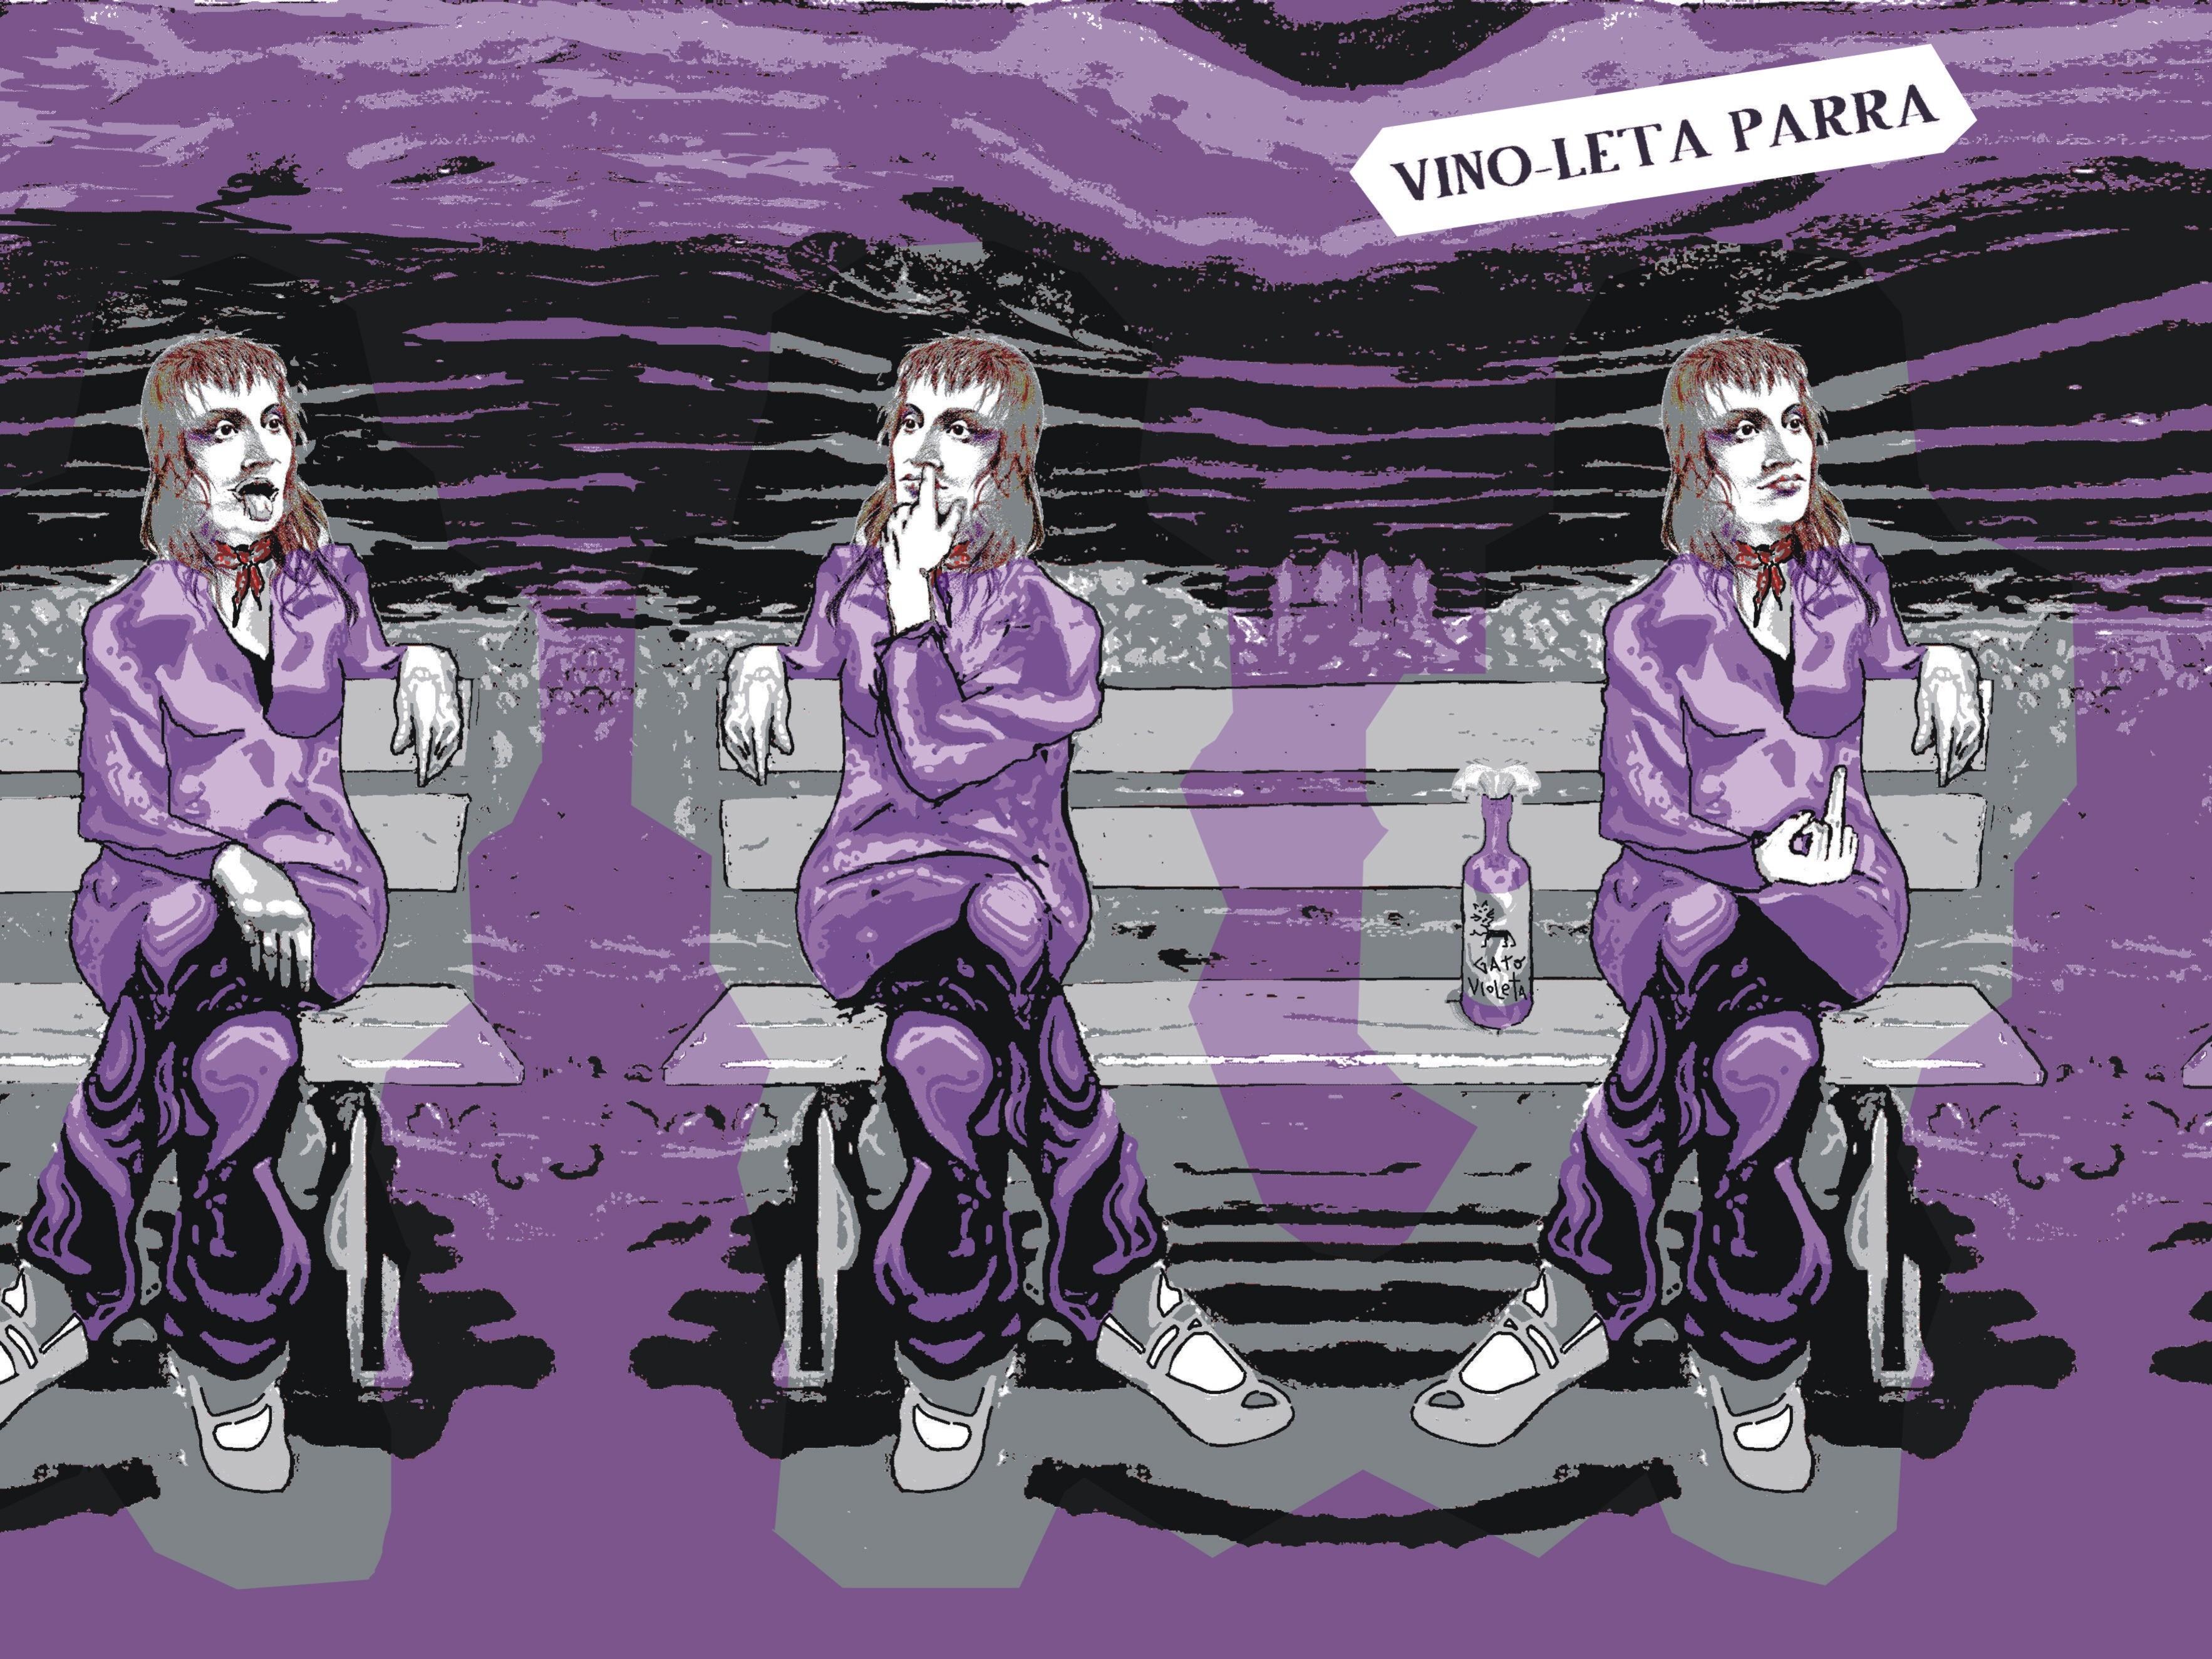 VIOLETA PARRA x CUECA y TONADA